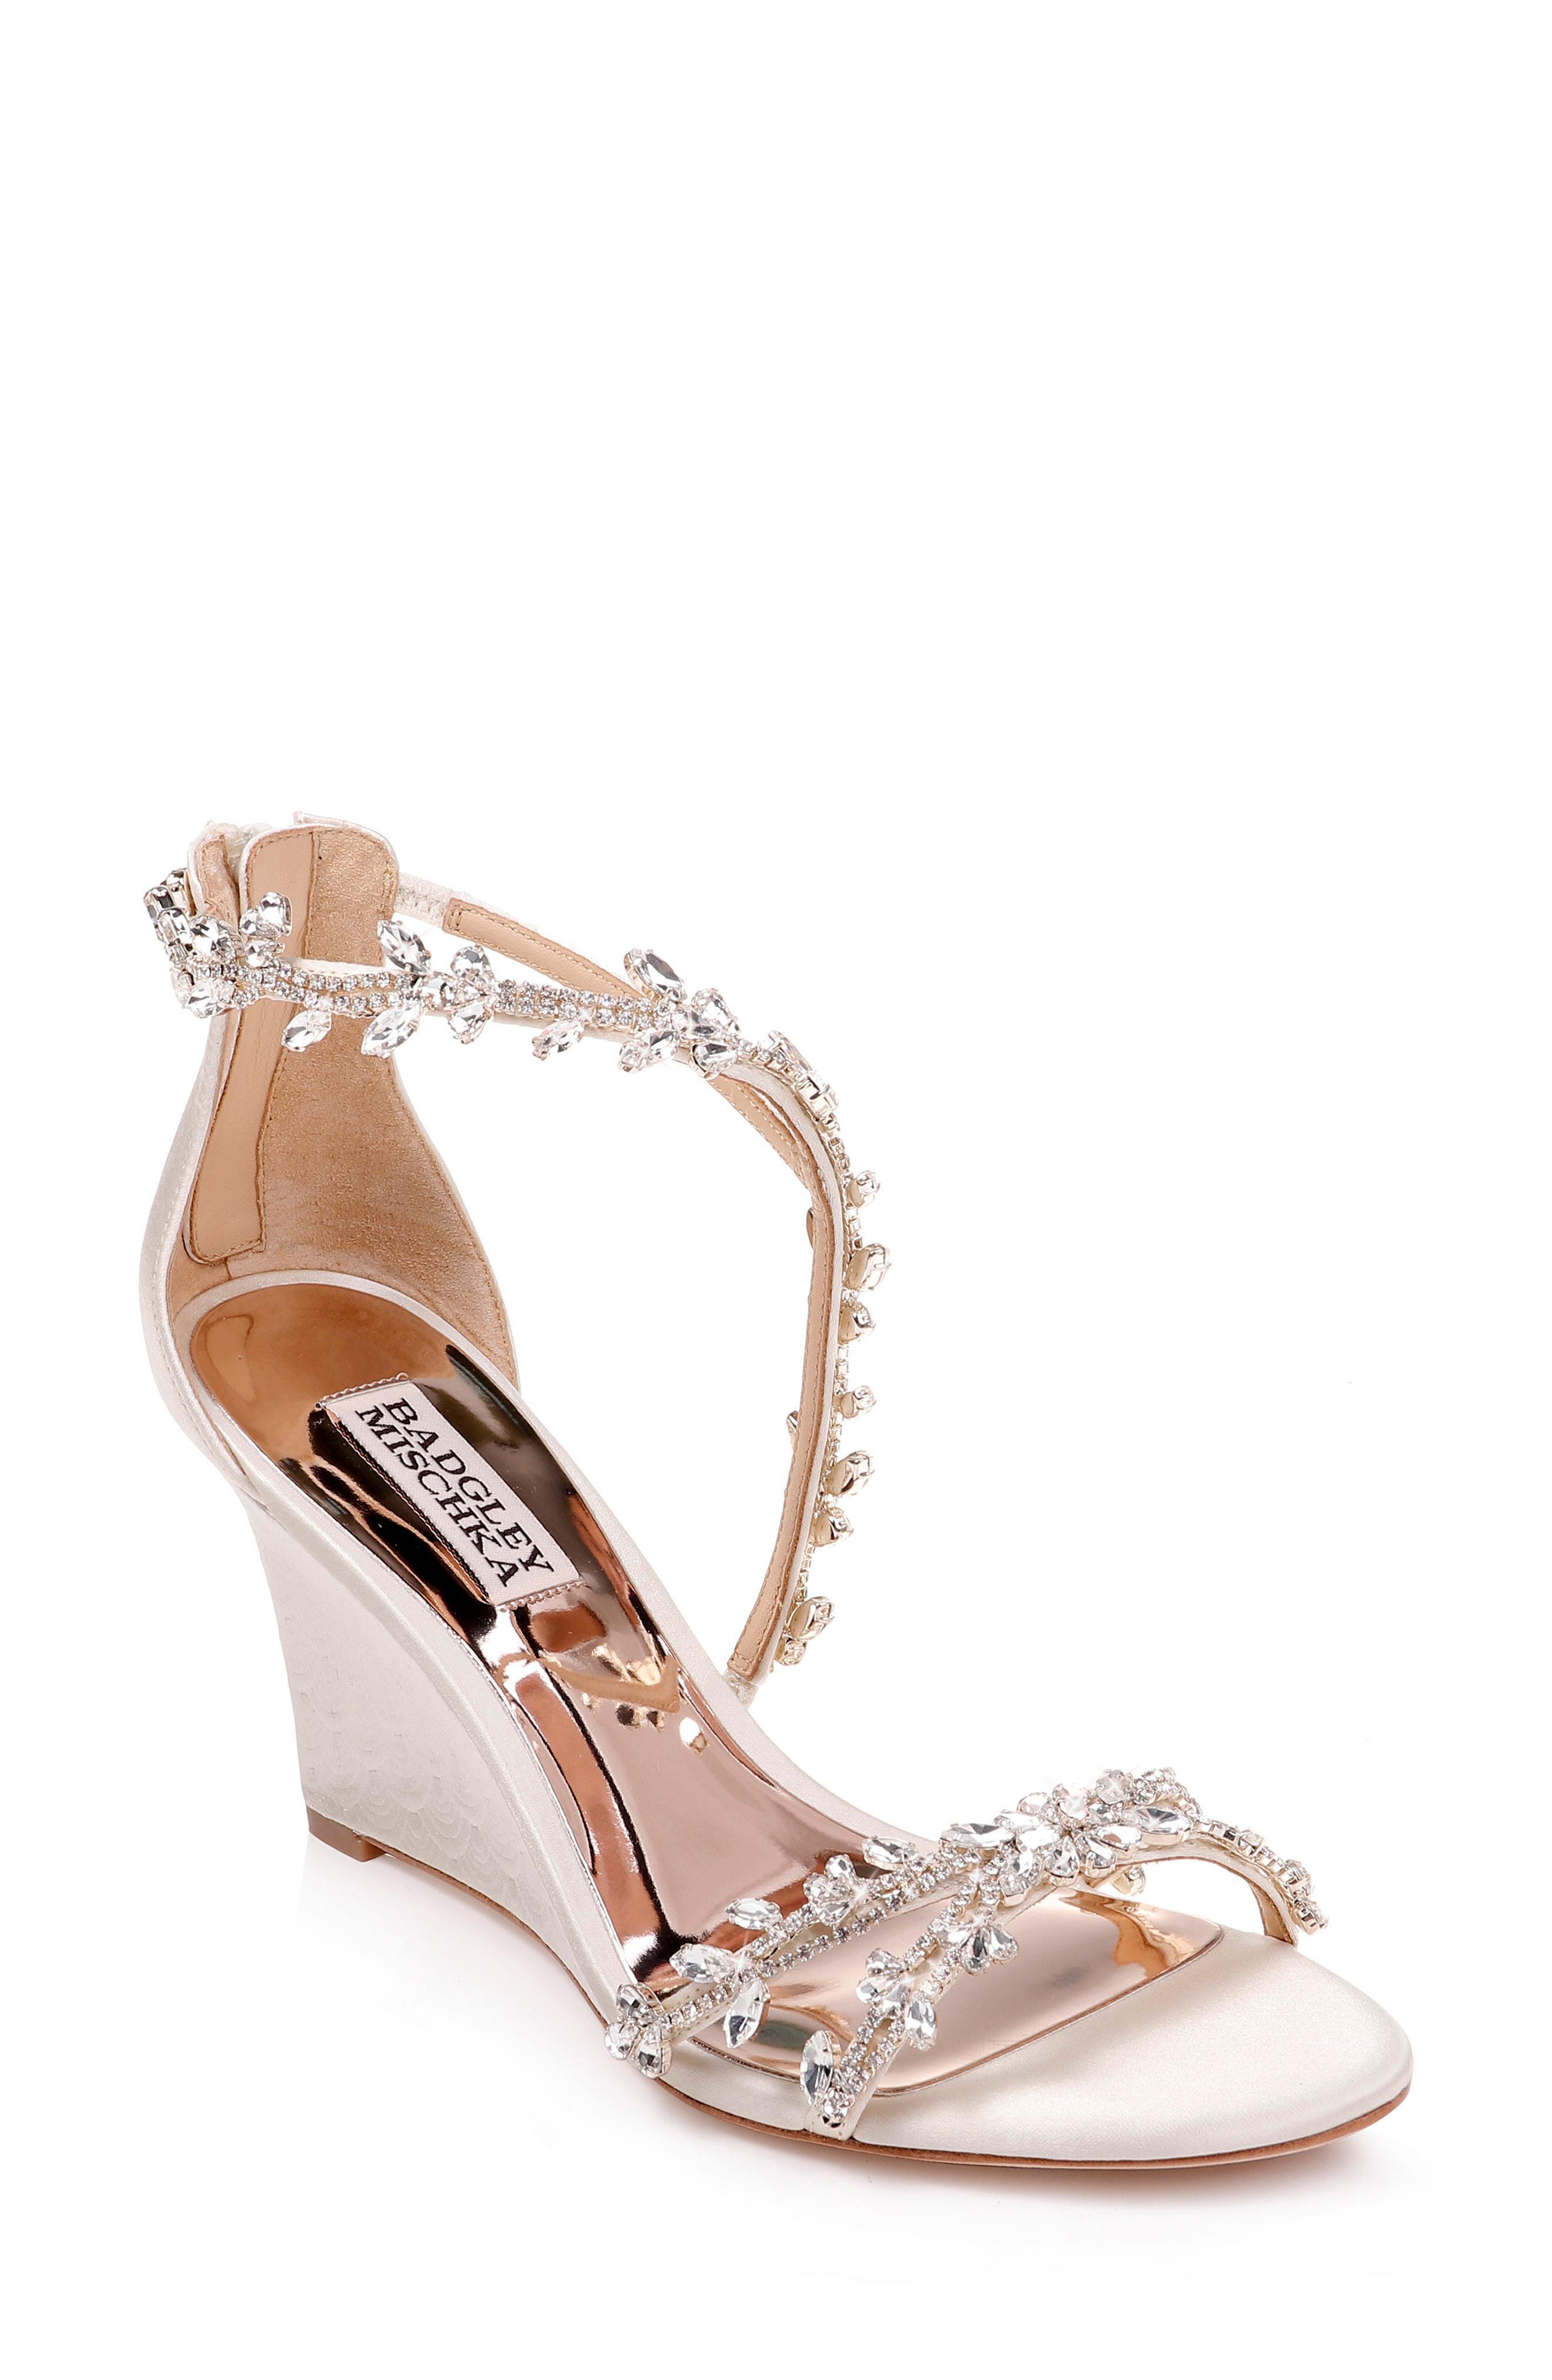 161879aa16c Lyst - Badgley Mischka Feather Crystal Embellished Wedge Sandal